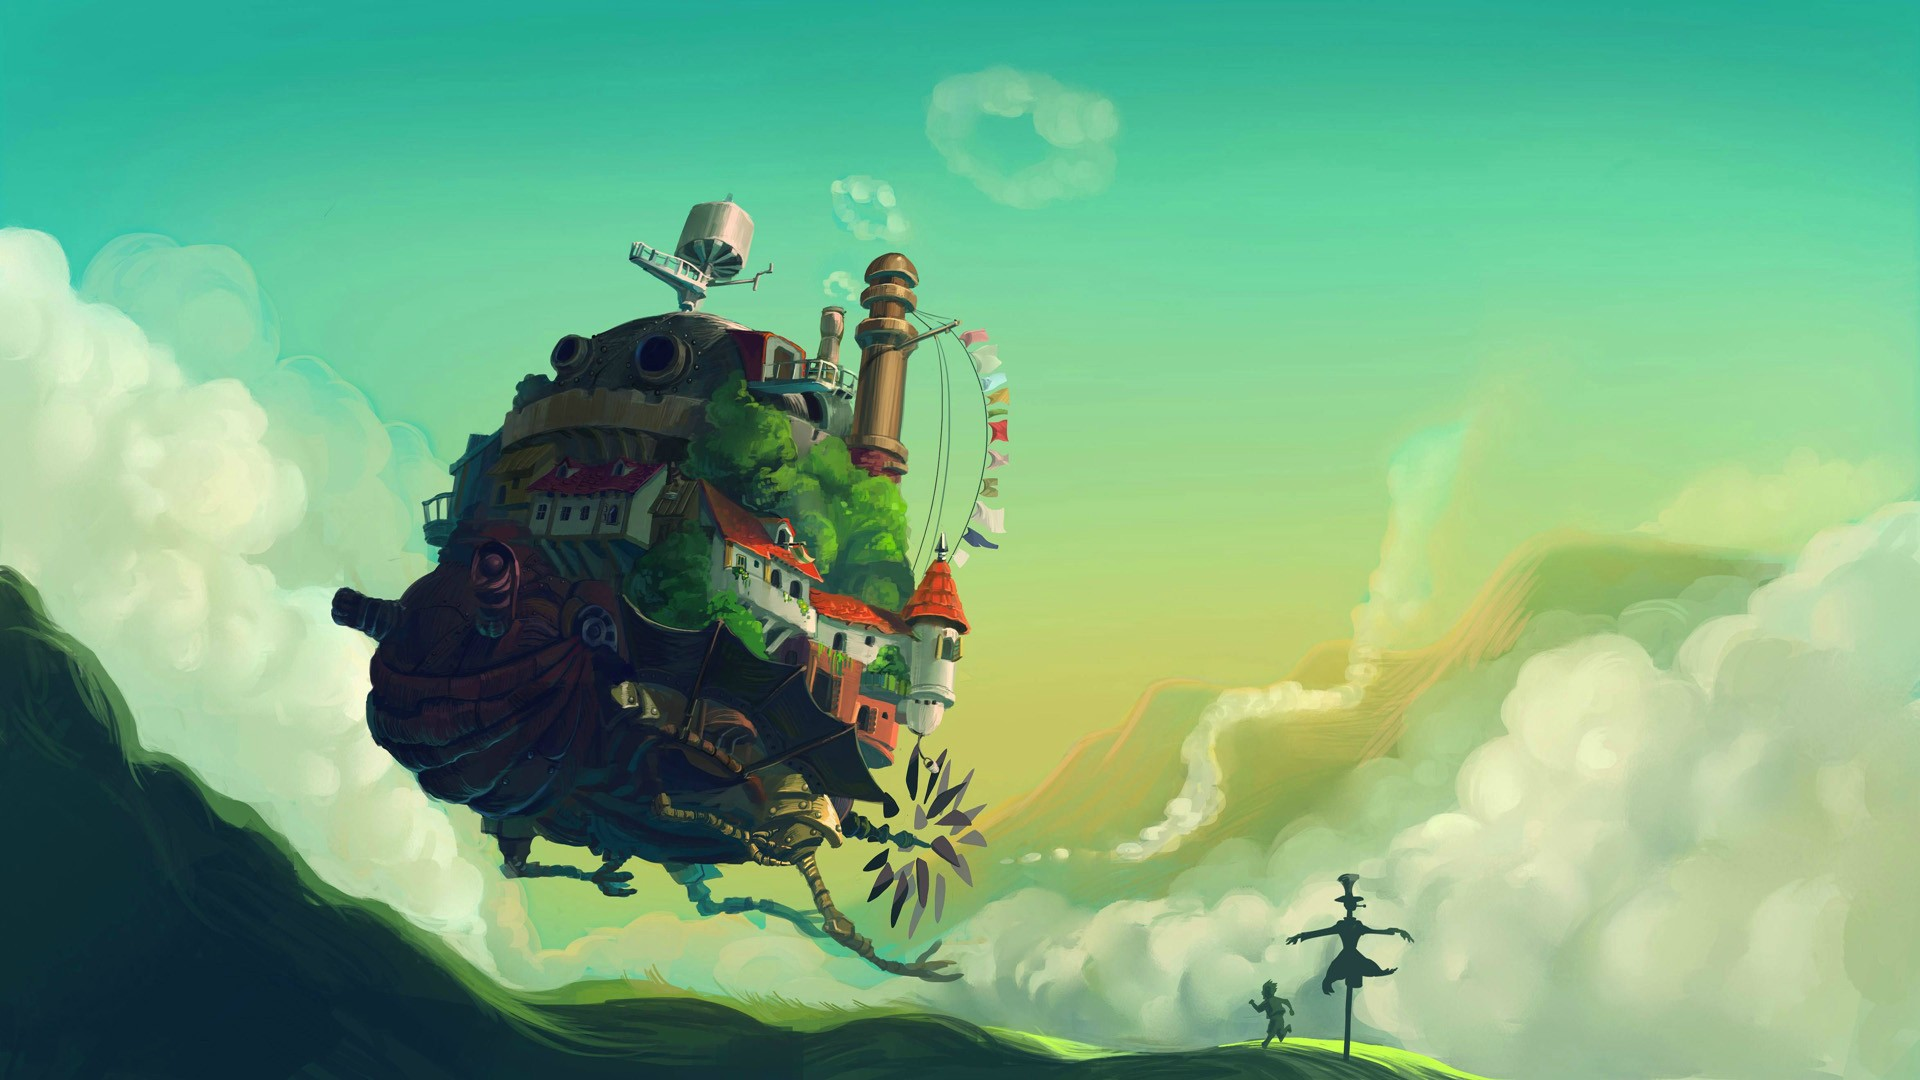 dddbccfcabcbacb-howls-moving-castle-hayao-miyazaki-wallpaper-wp3401575